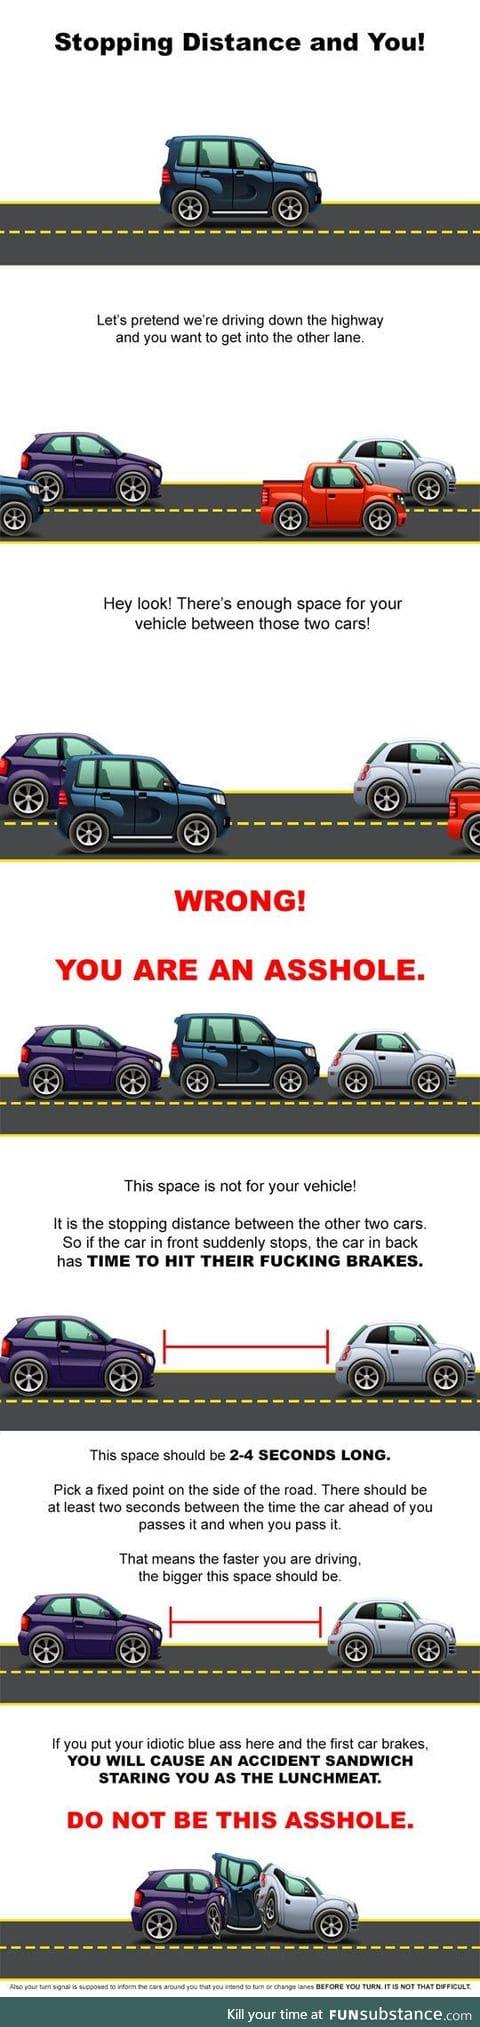 How to not drive like an ***hole